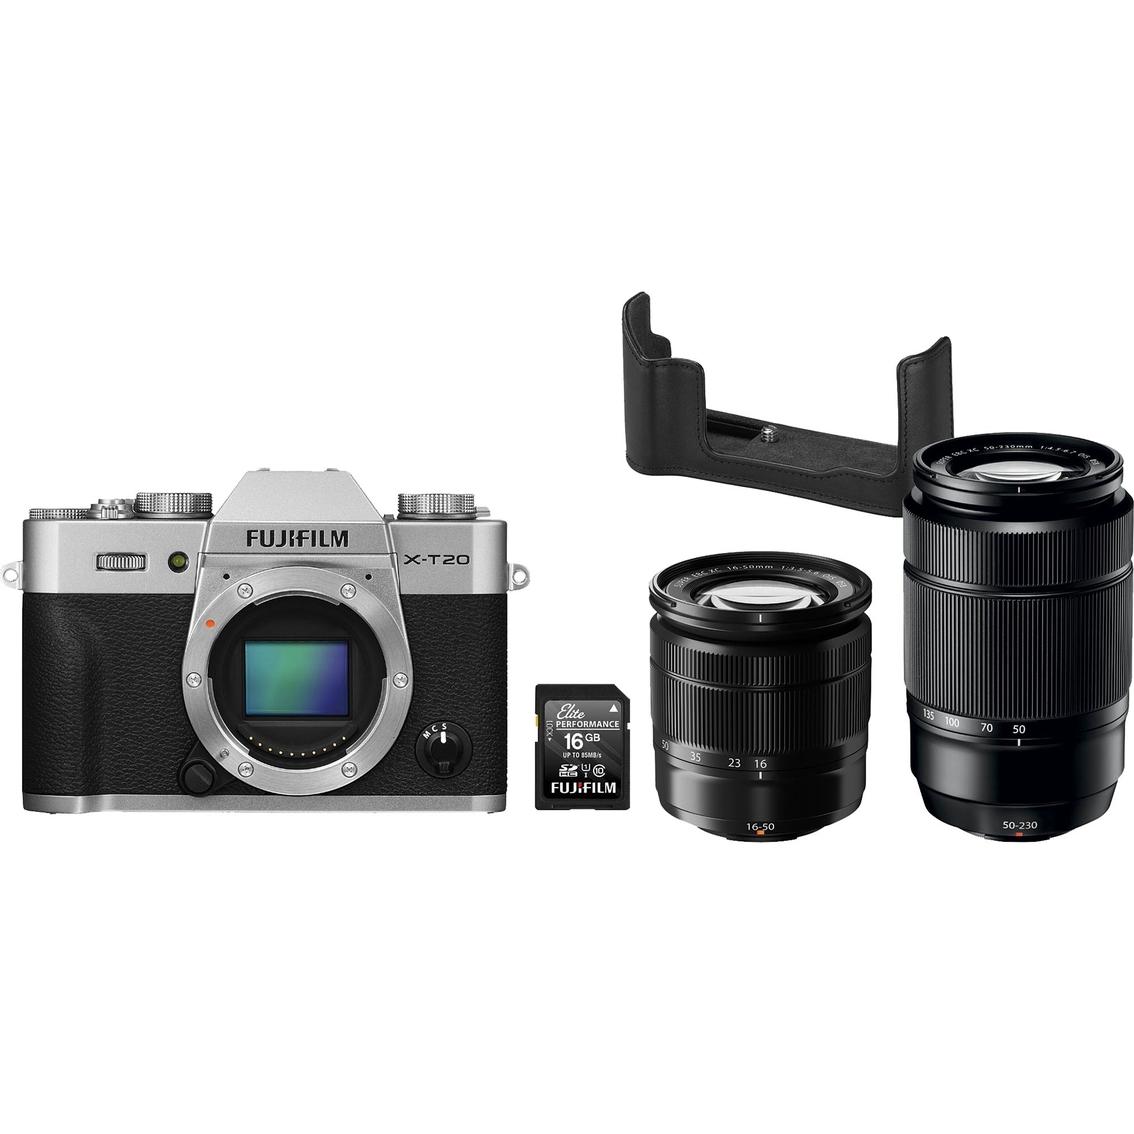 **Military Only** FujiFilm XT20 MAB Lightweight Digital Camera - $750